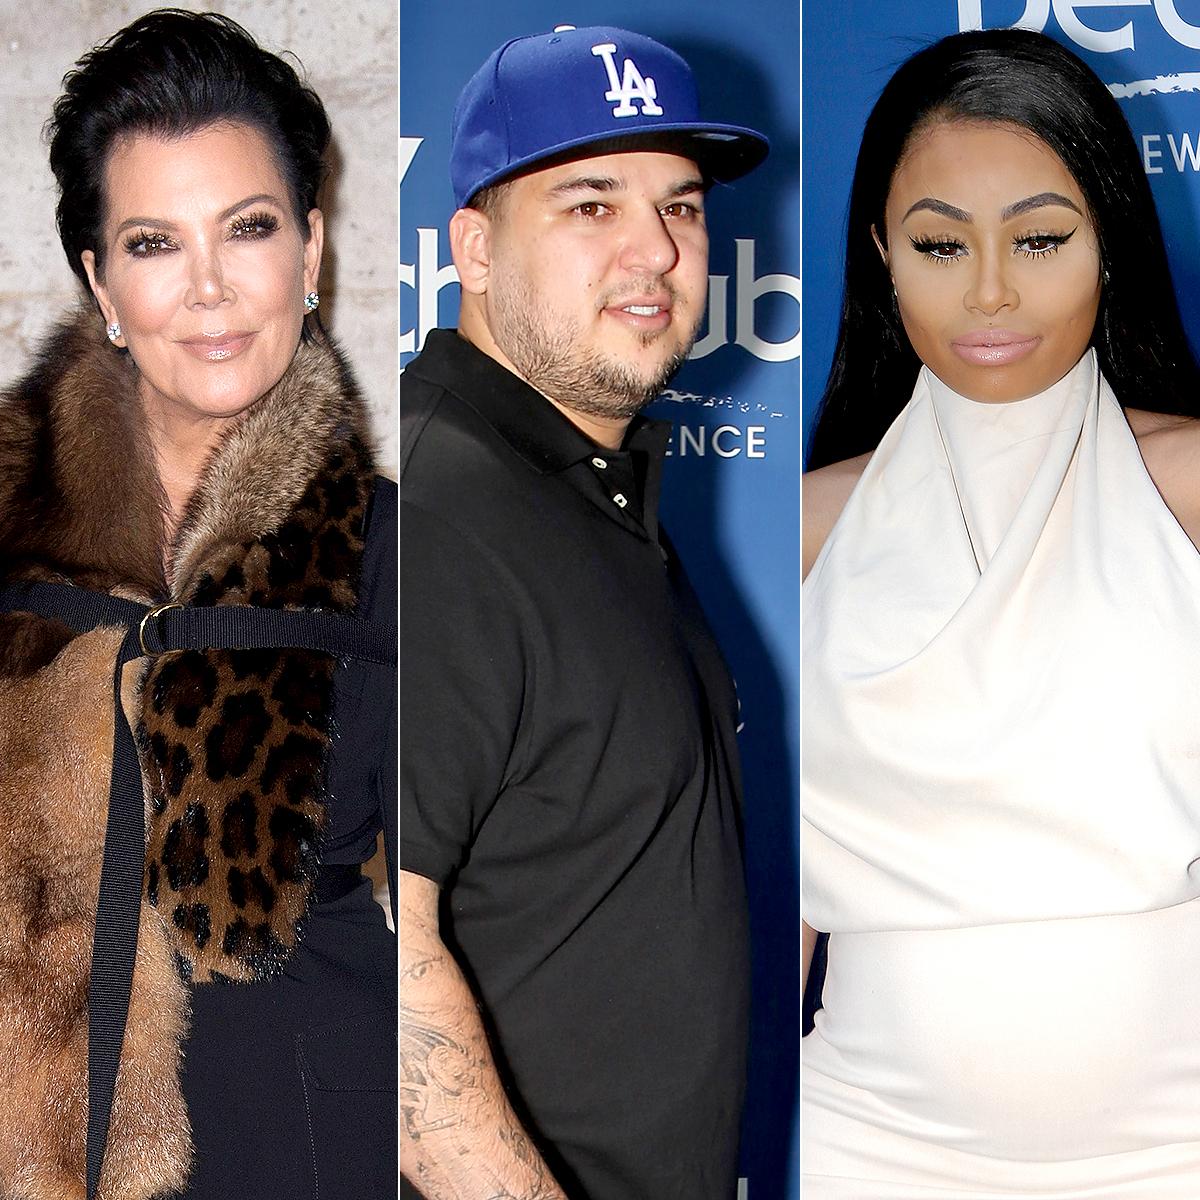 Kris Jenner, Rob Kardashian, and Blac Chyna